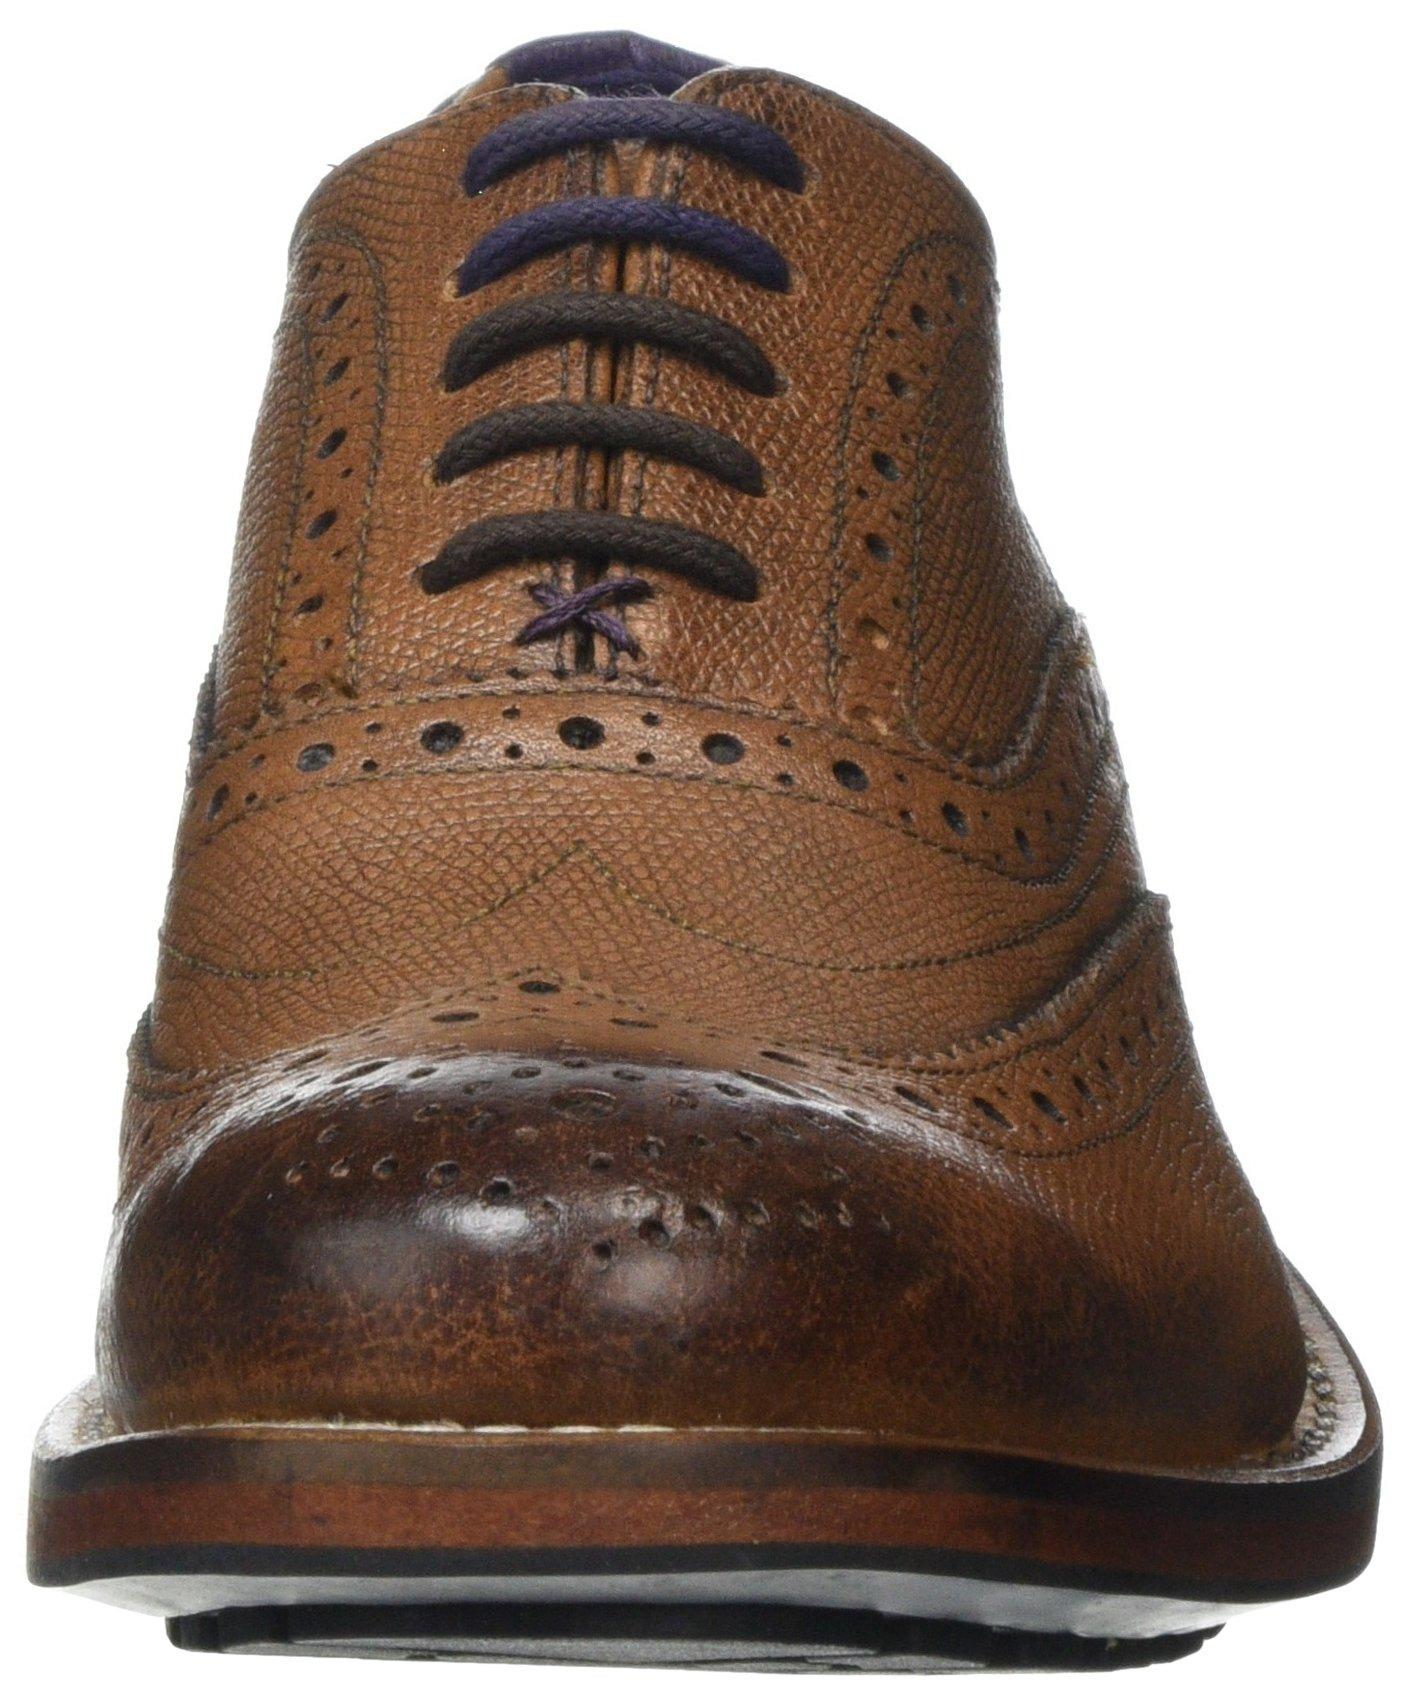 7d0fa02689e71 Ted Baker Mens Guri 8 Oxford Brogue Shoes – Rockhitech